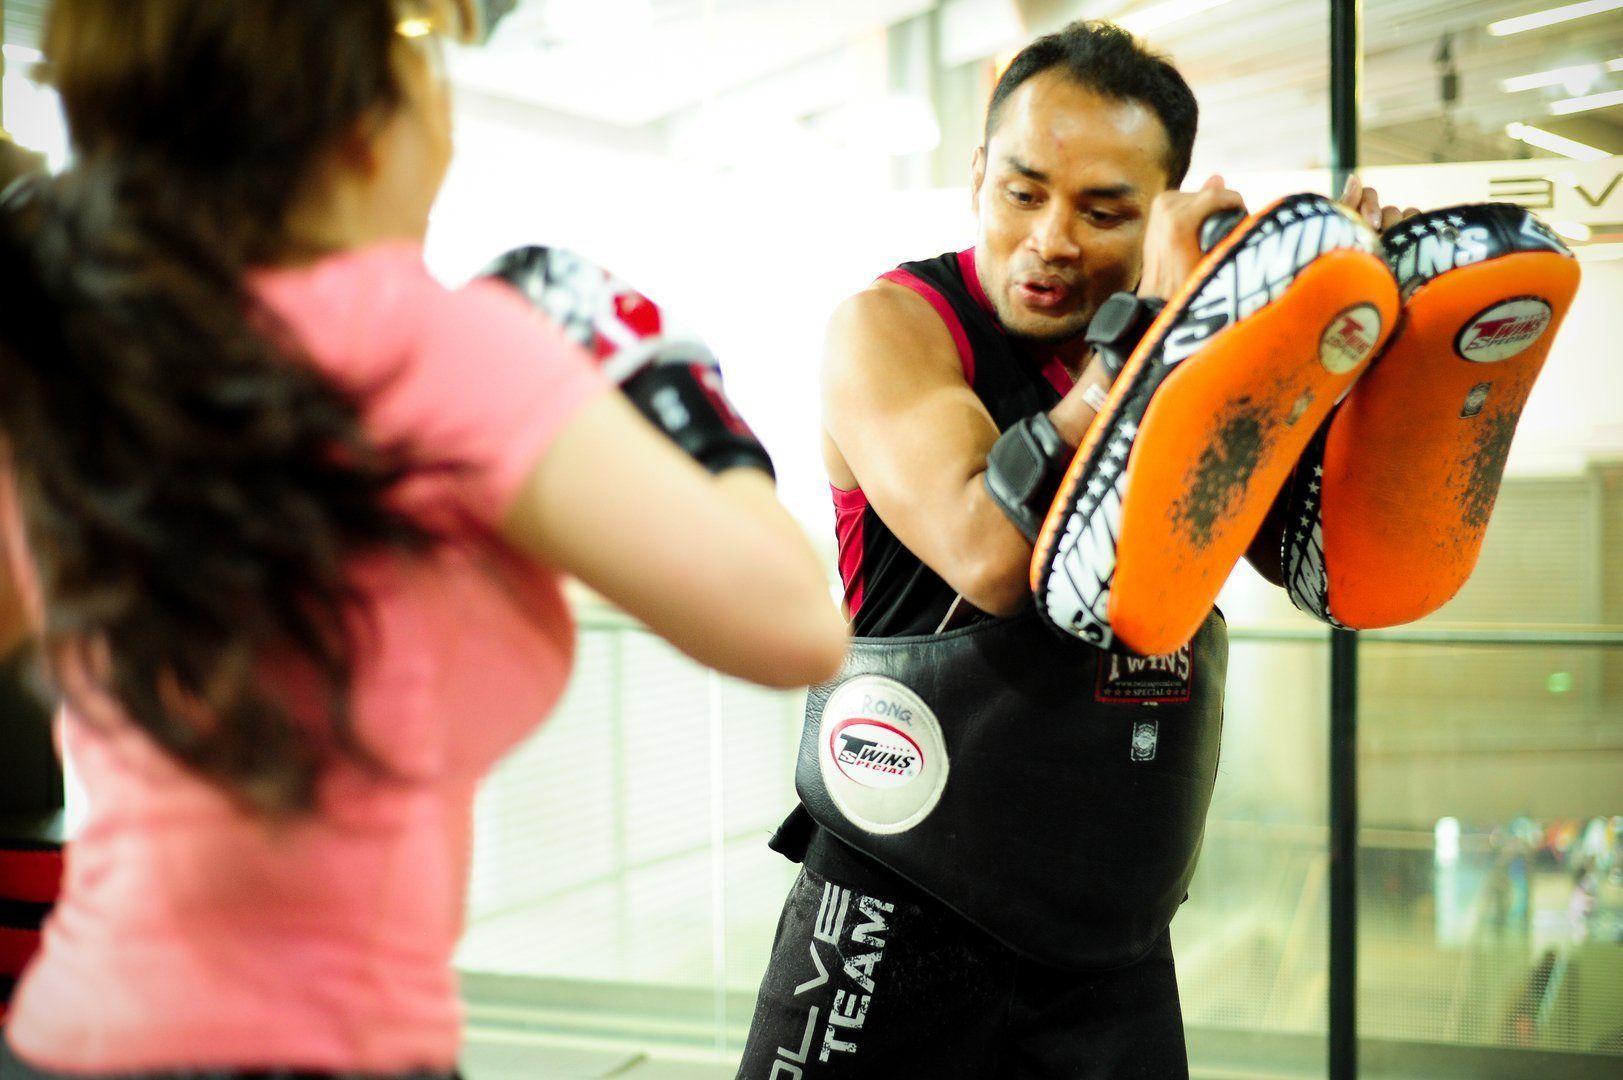 ONE Superstar Dejdamrong Sor Amnuaysirichoke teaches Muay Thai at Evolve MMA.